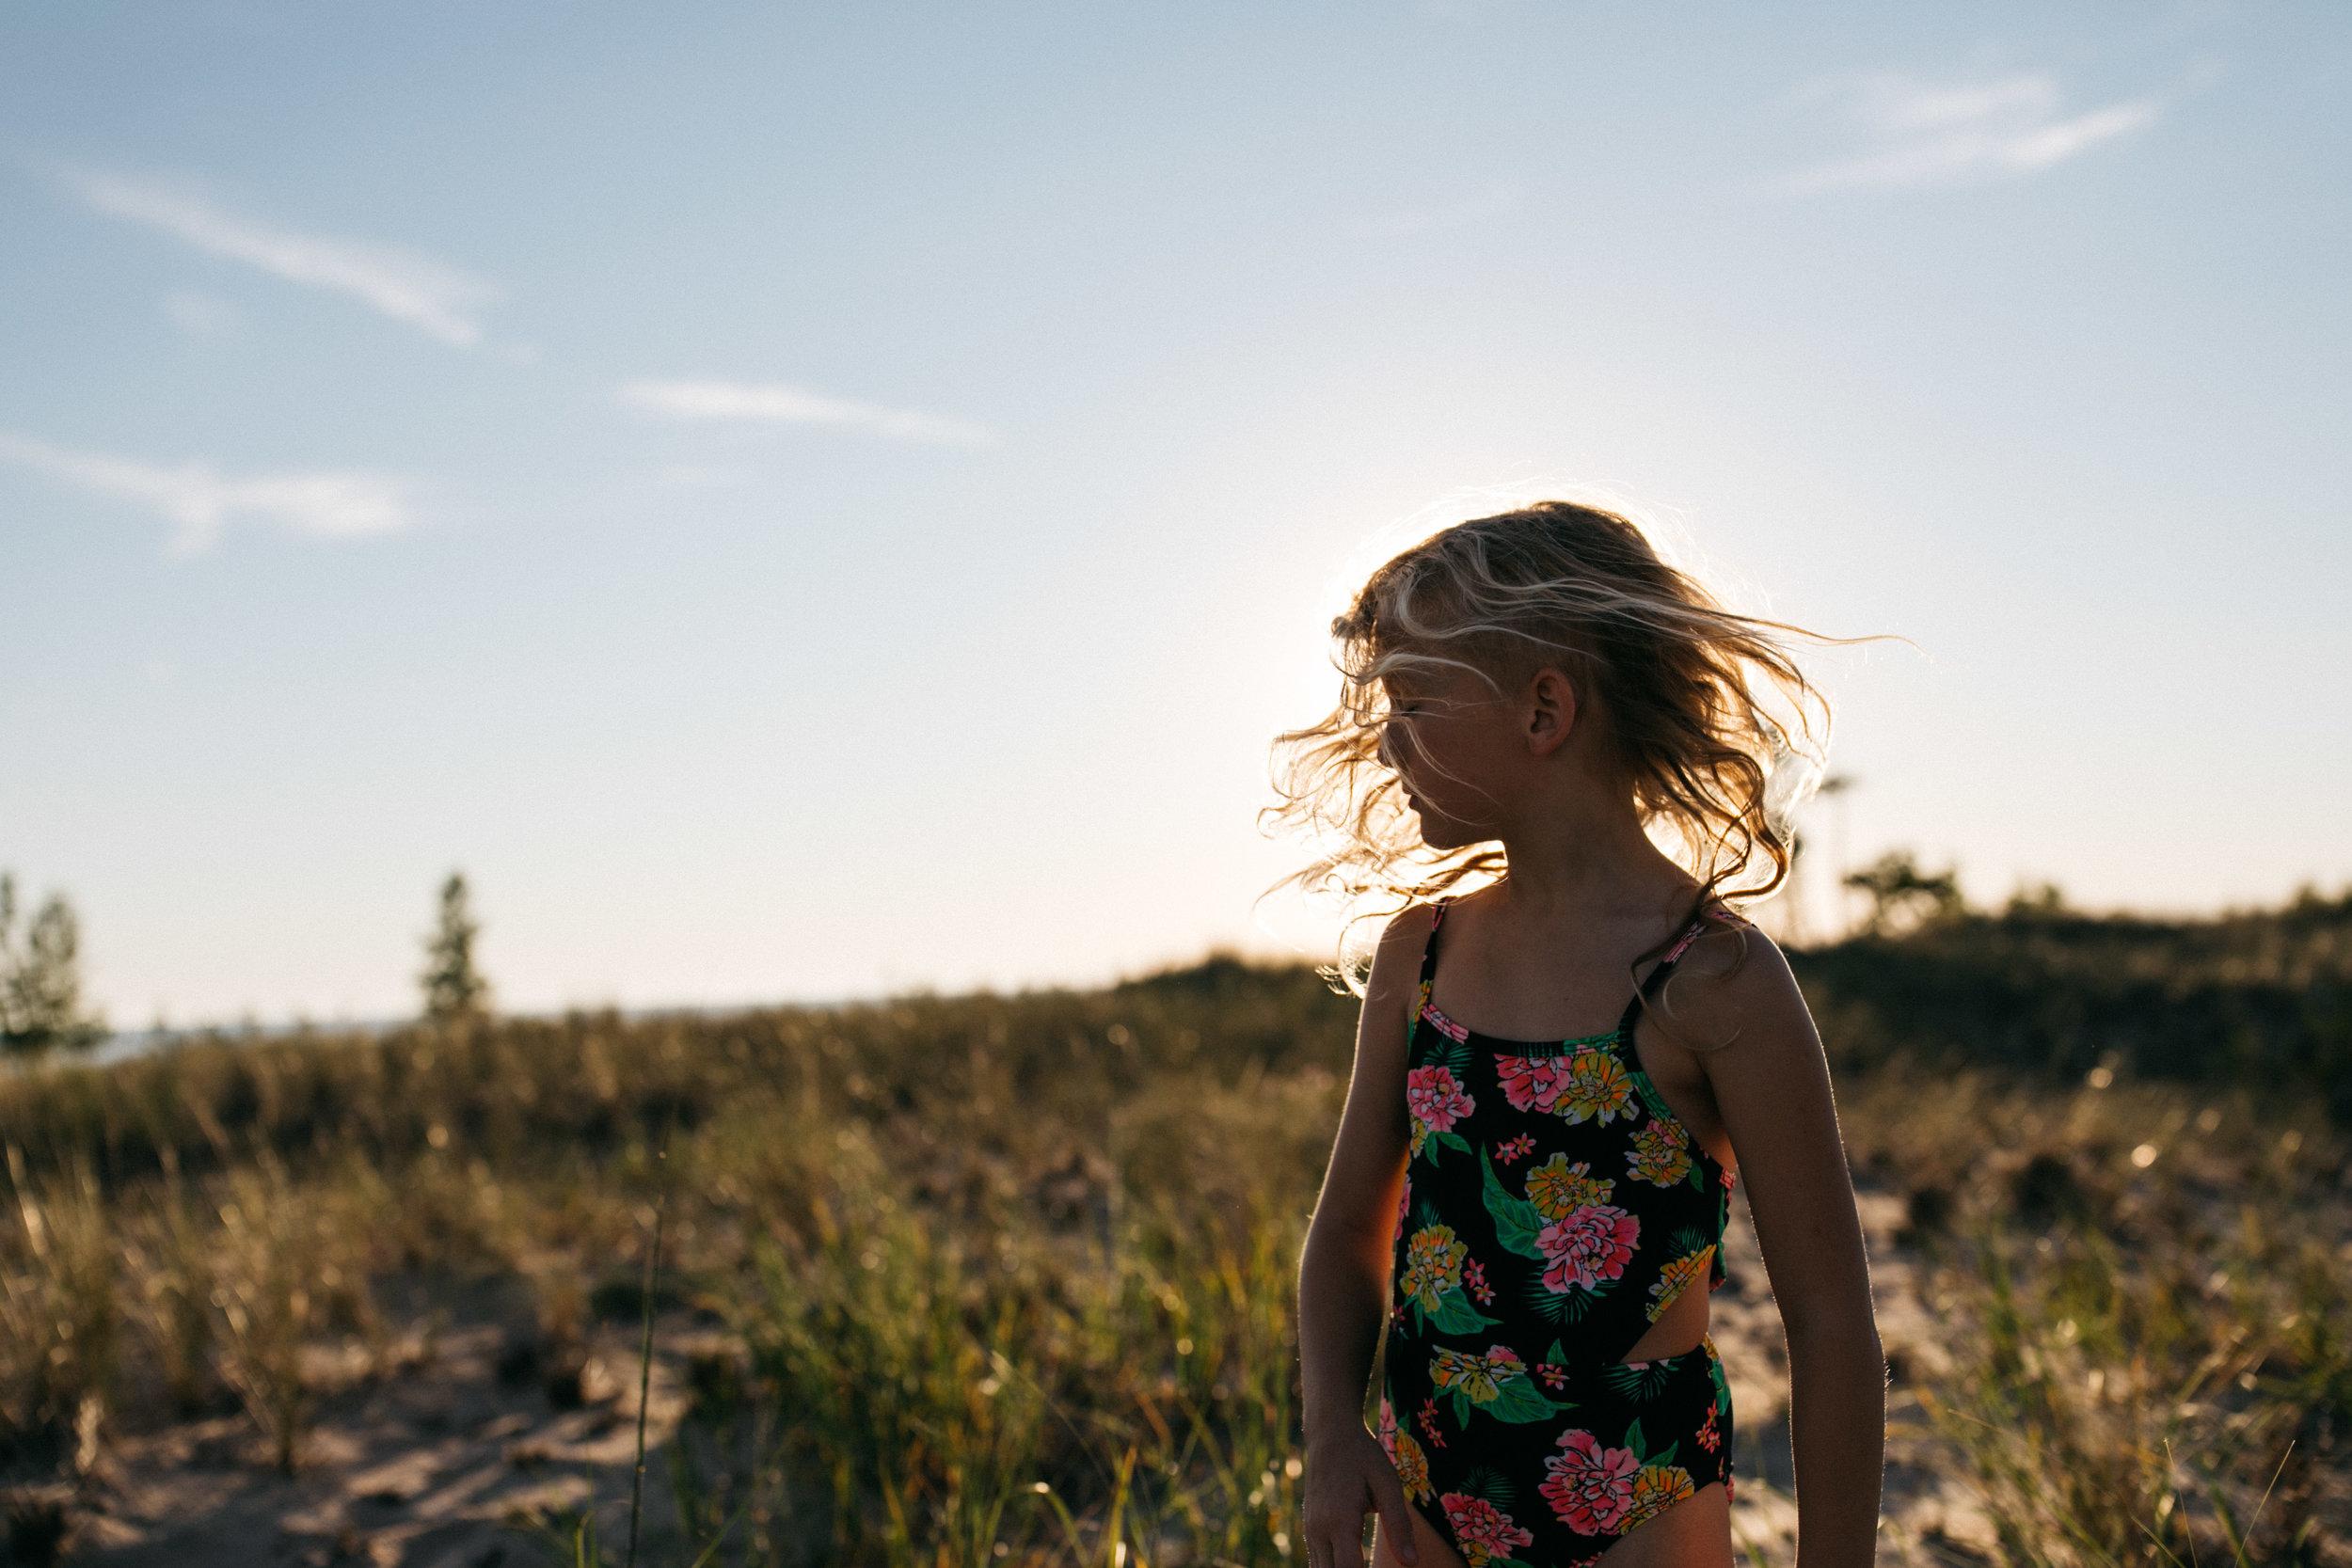 michigan-storytelling-photographer-ludington-beach-live-28.jpg